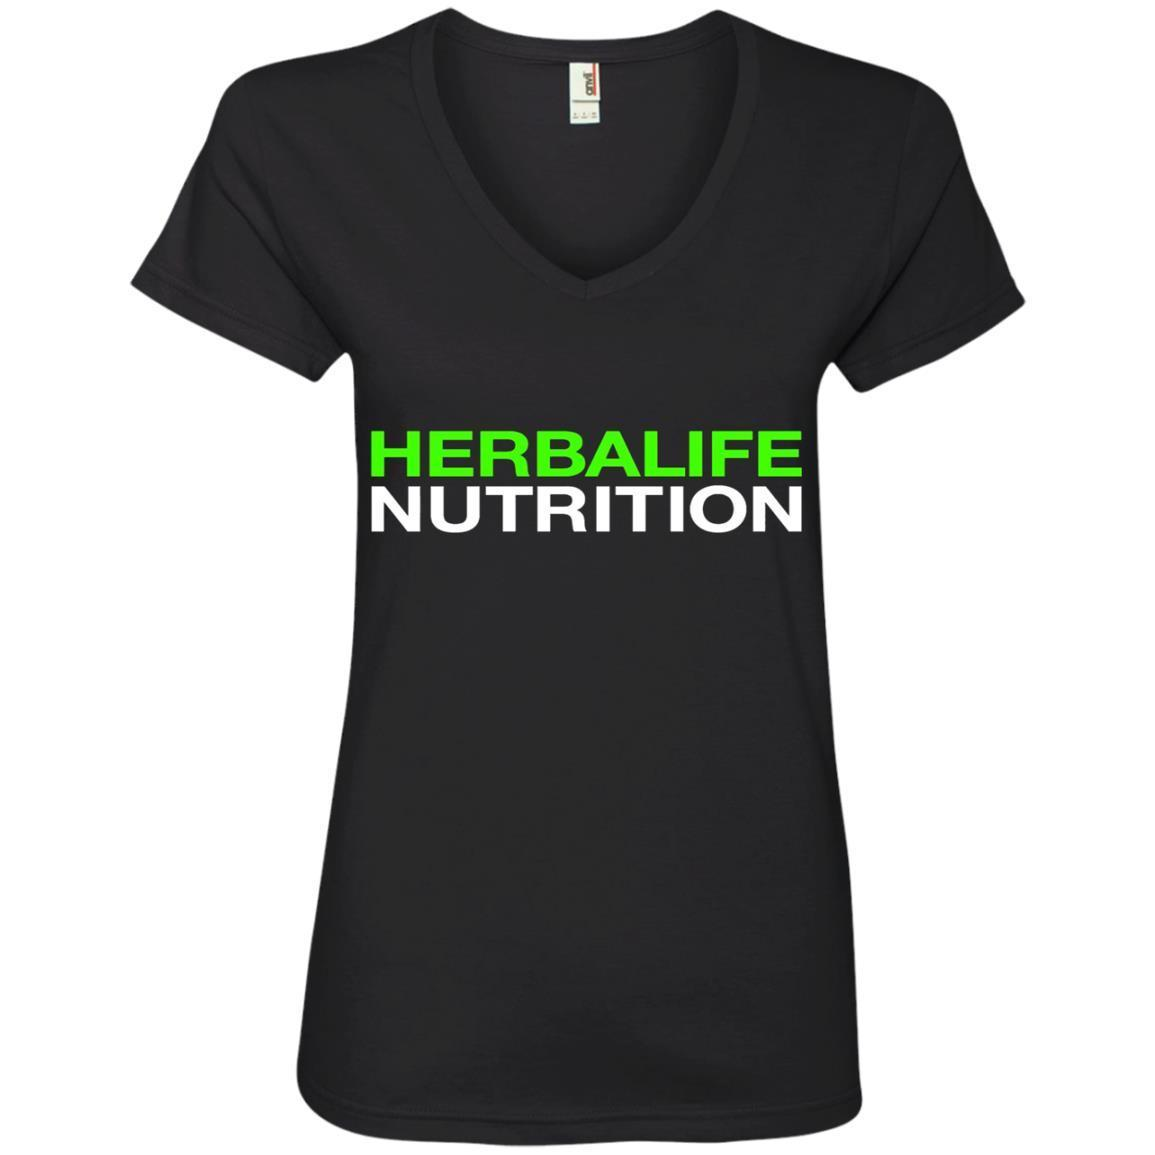 HERBALIFE NUTRITION – Ladies' V-Neck T-Shirt